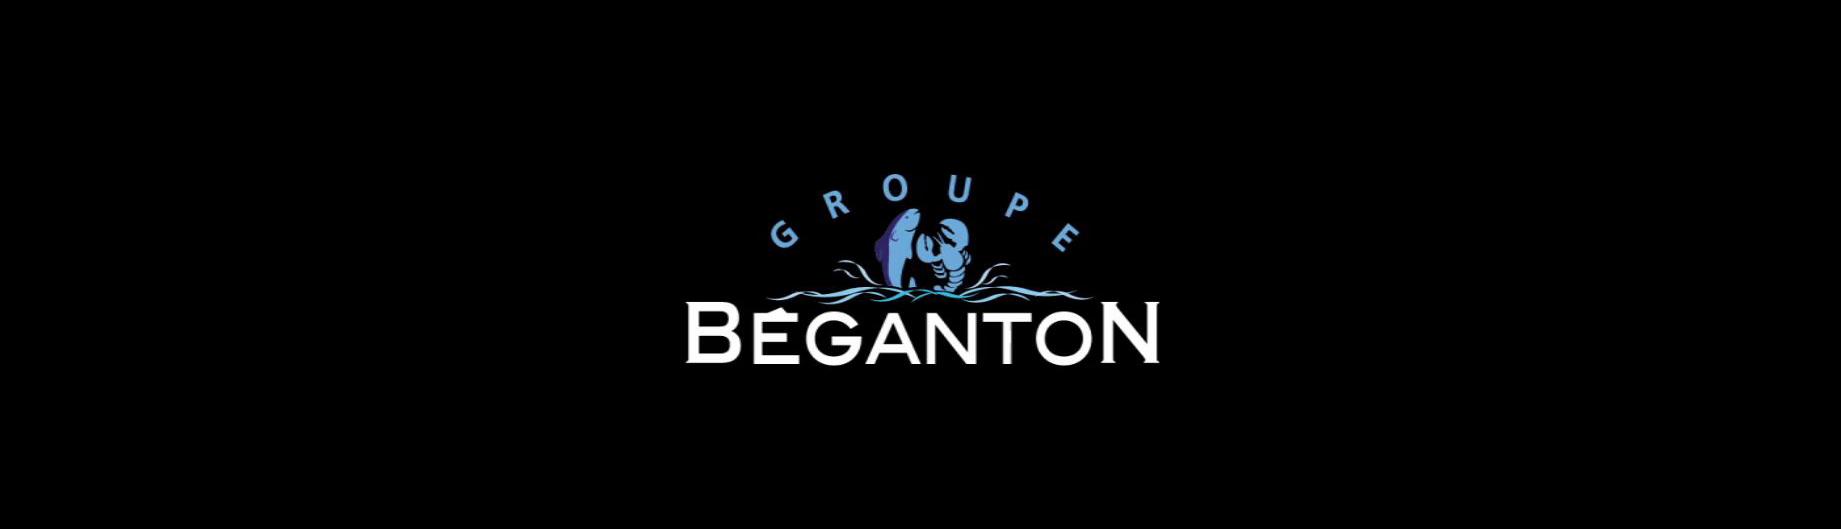 Discover Béganton in video